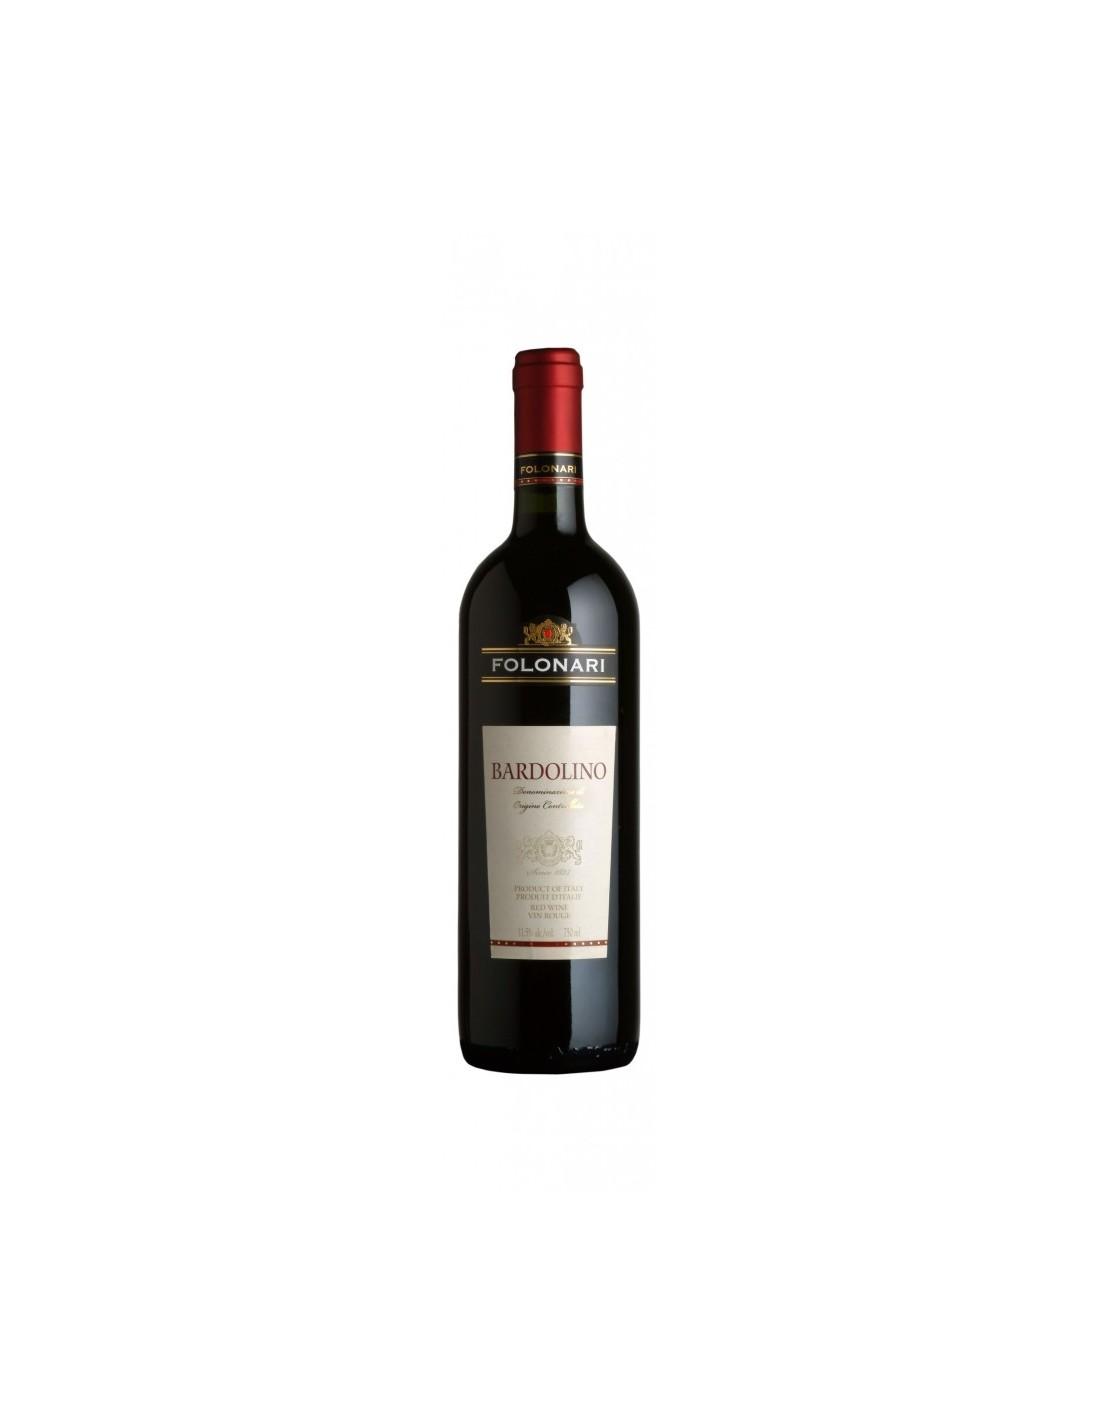 Vin rosu sec Folonari, Bardolino, 12% alc., 0.75L, Italia